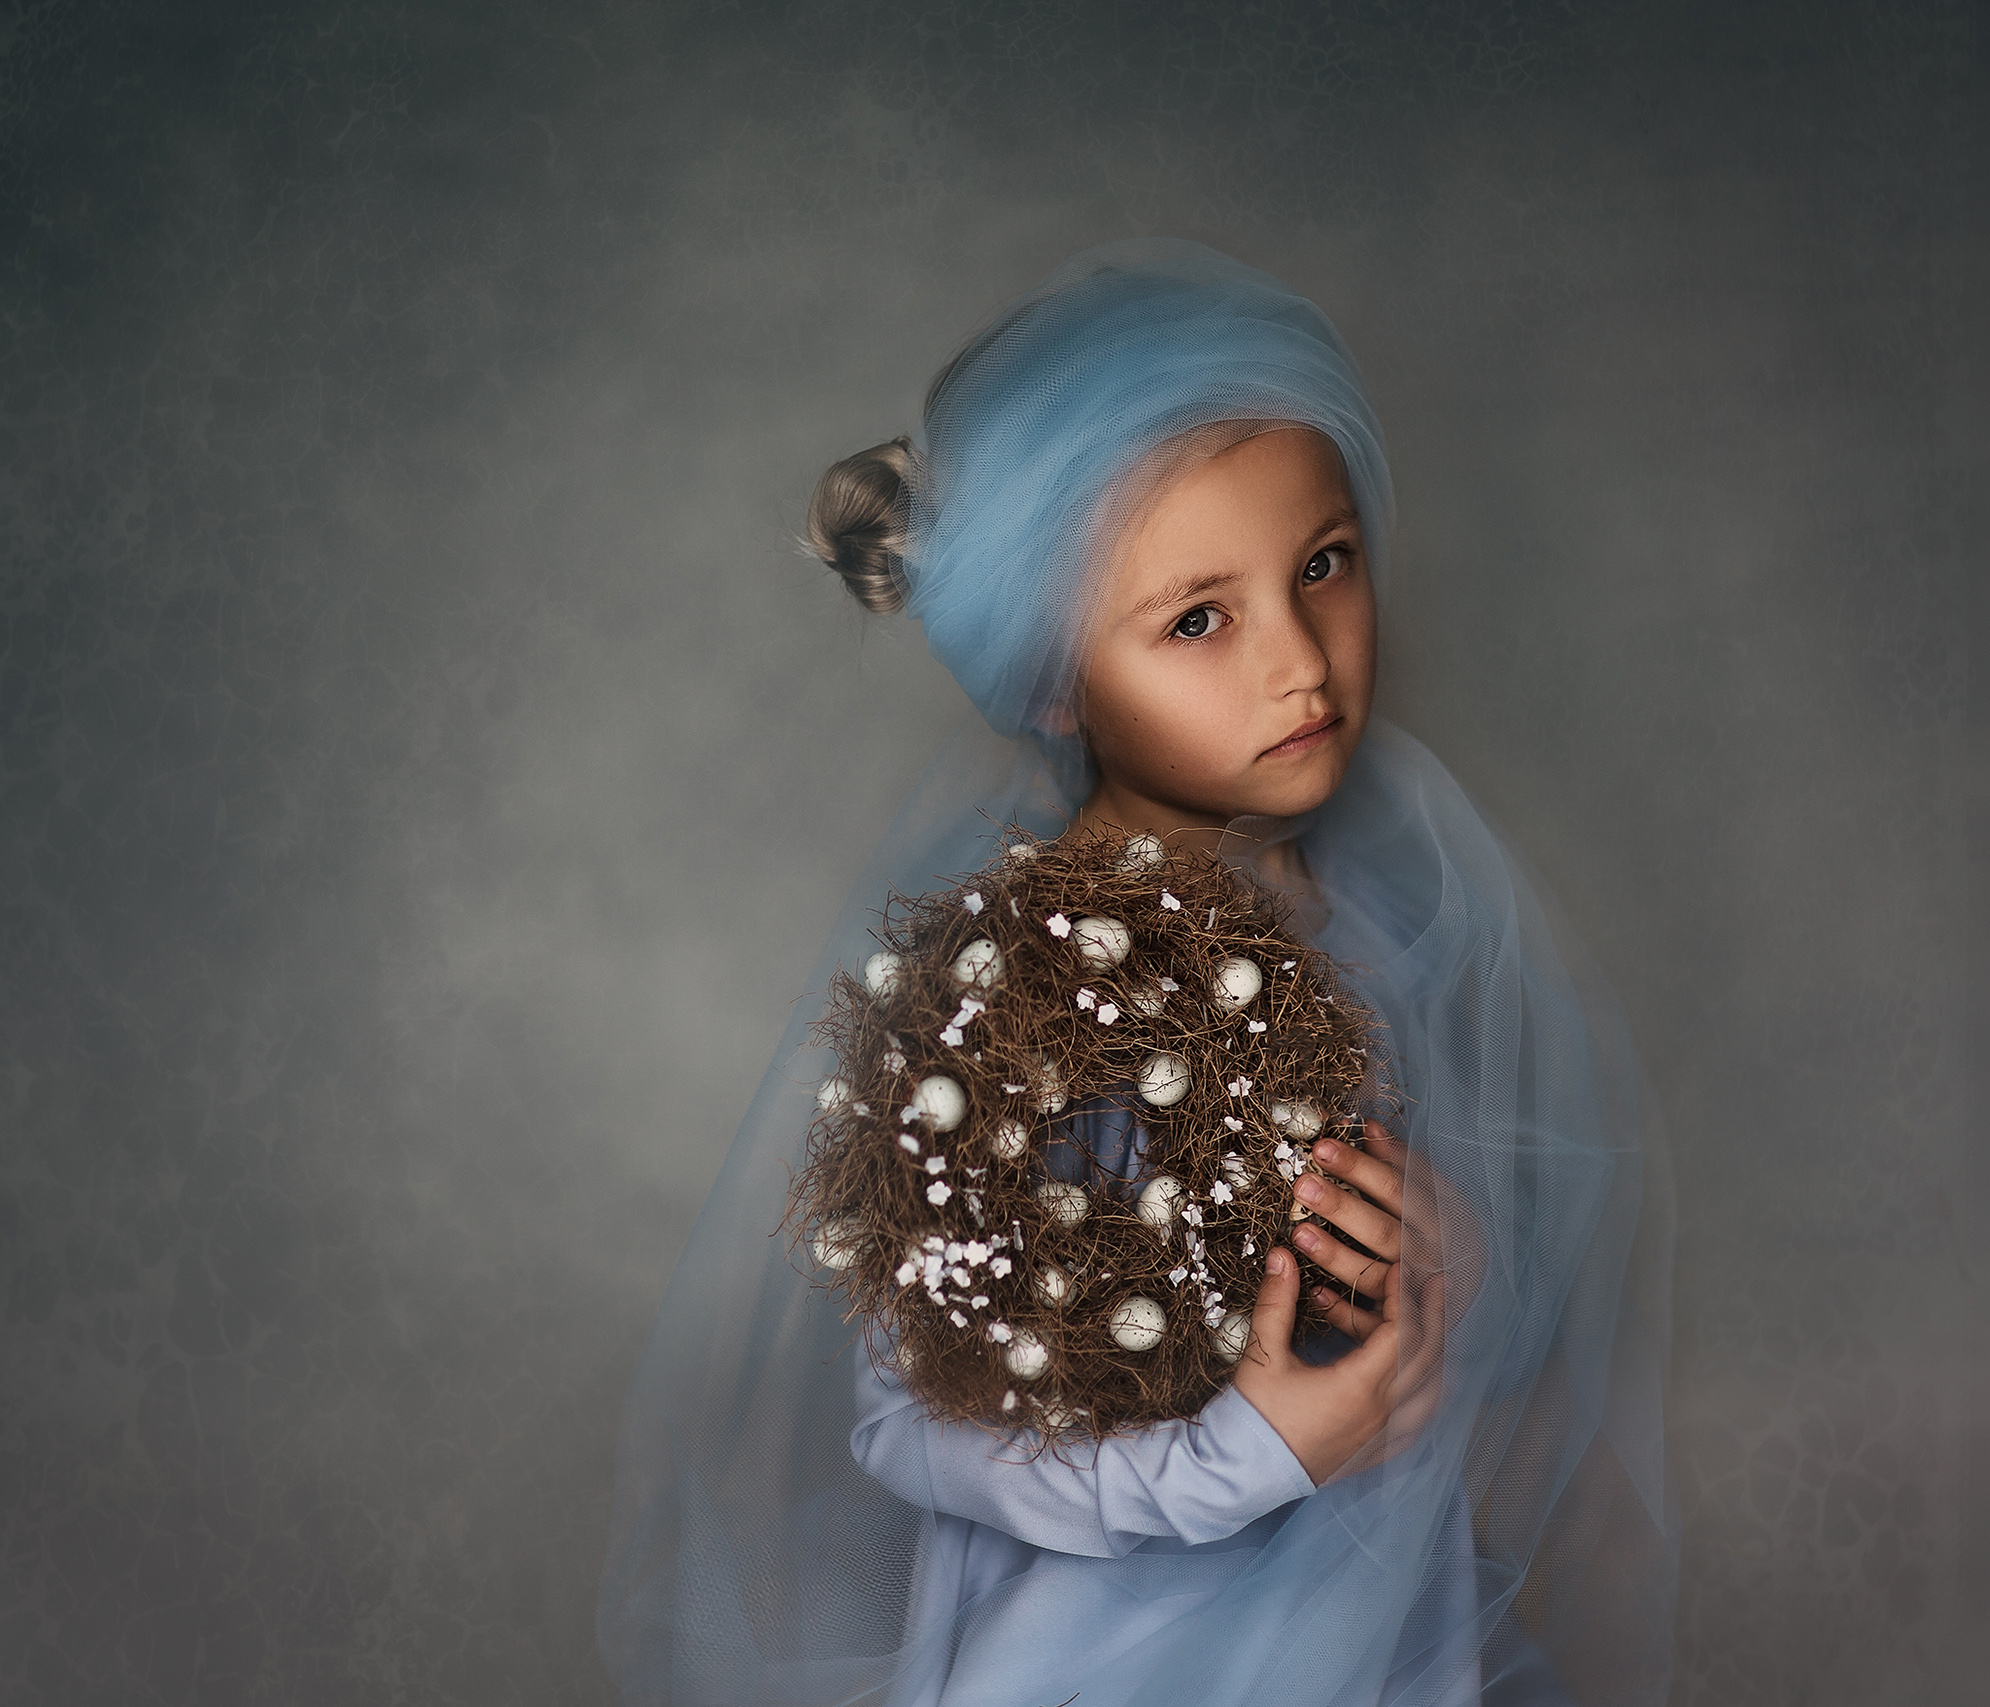 Roberta_Baneviciene_Portrait Avant Garde_April_UK_17_138607.jpg